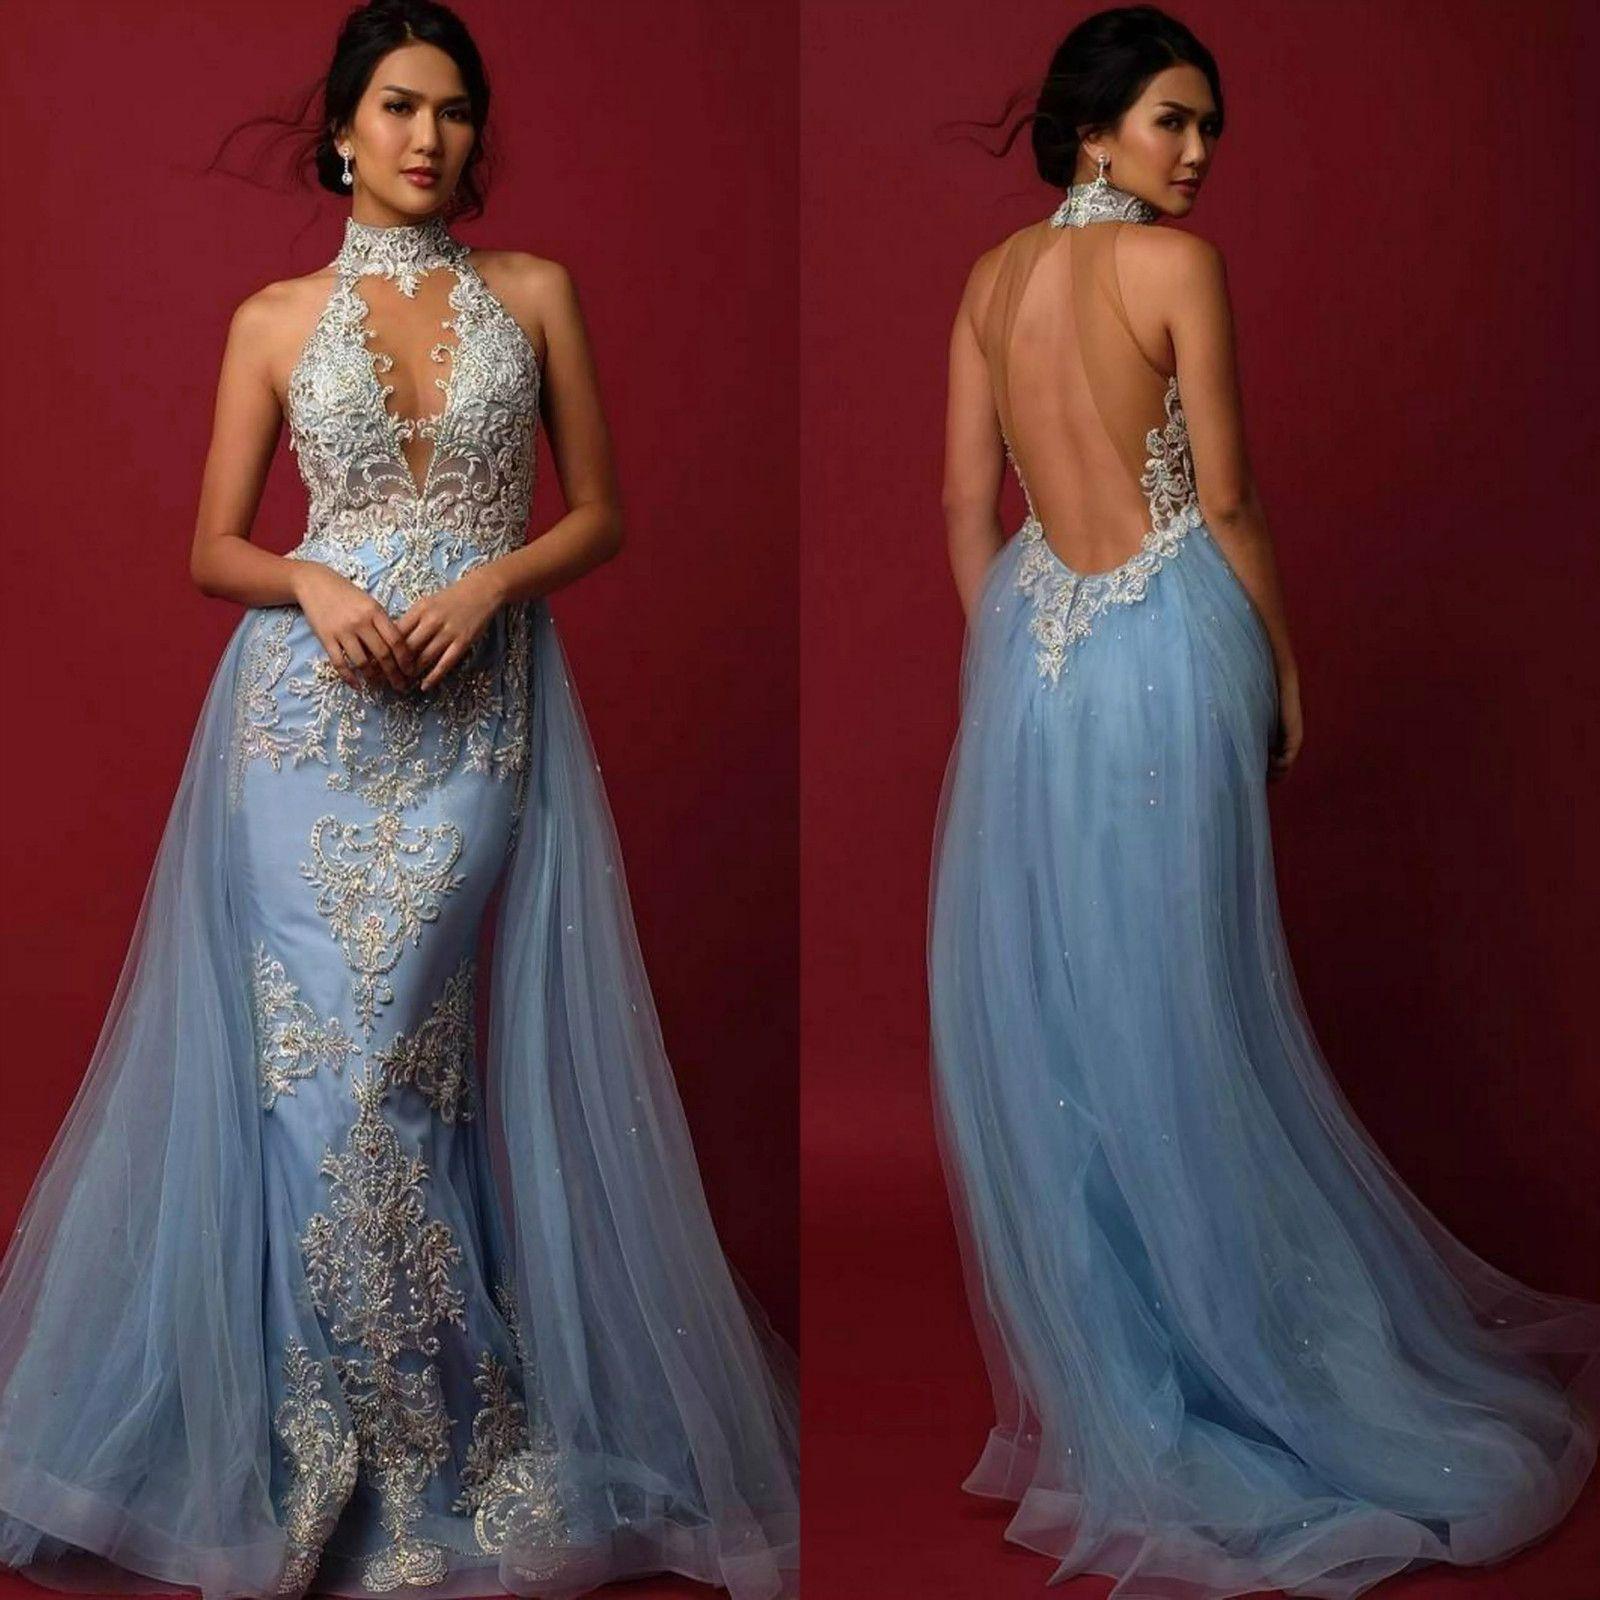 High Neck Light Blue Illusion Formal Dresses Evening Wear Applique